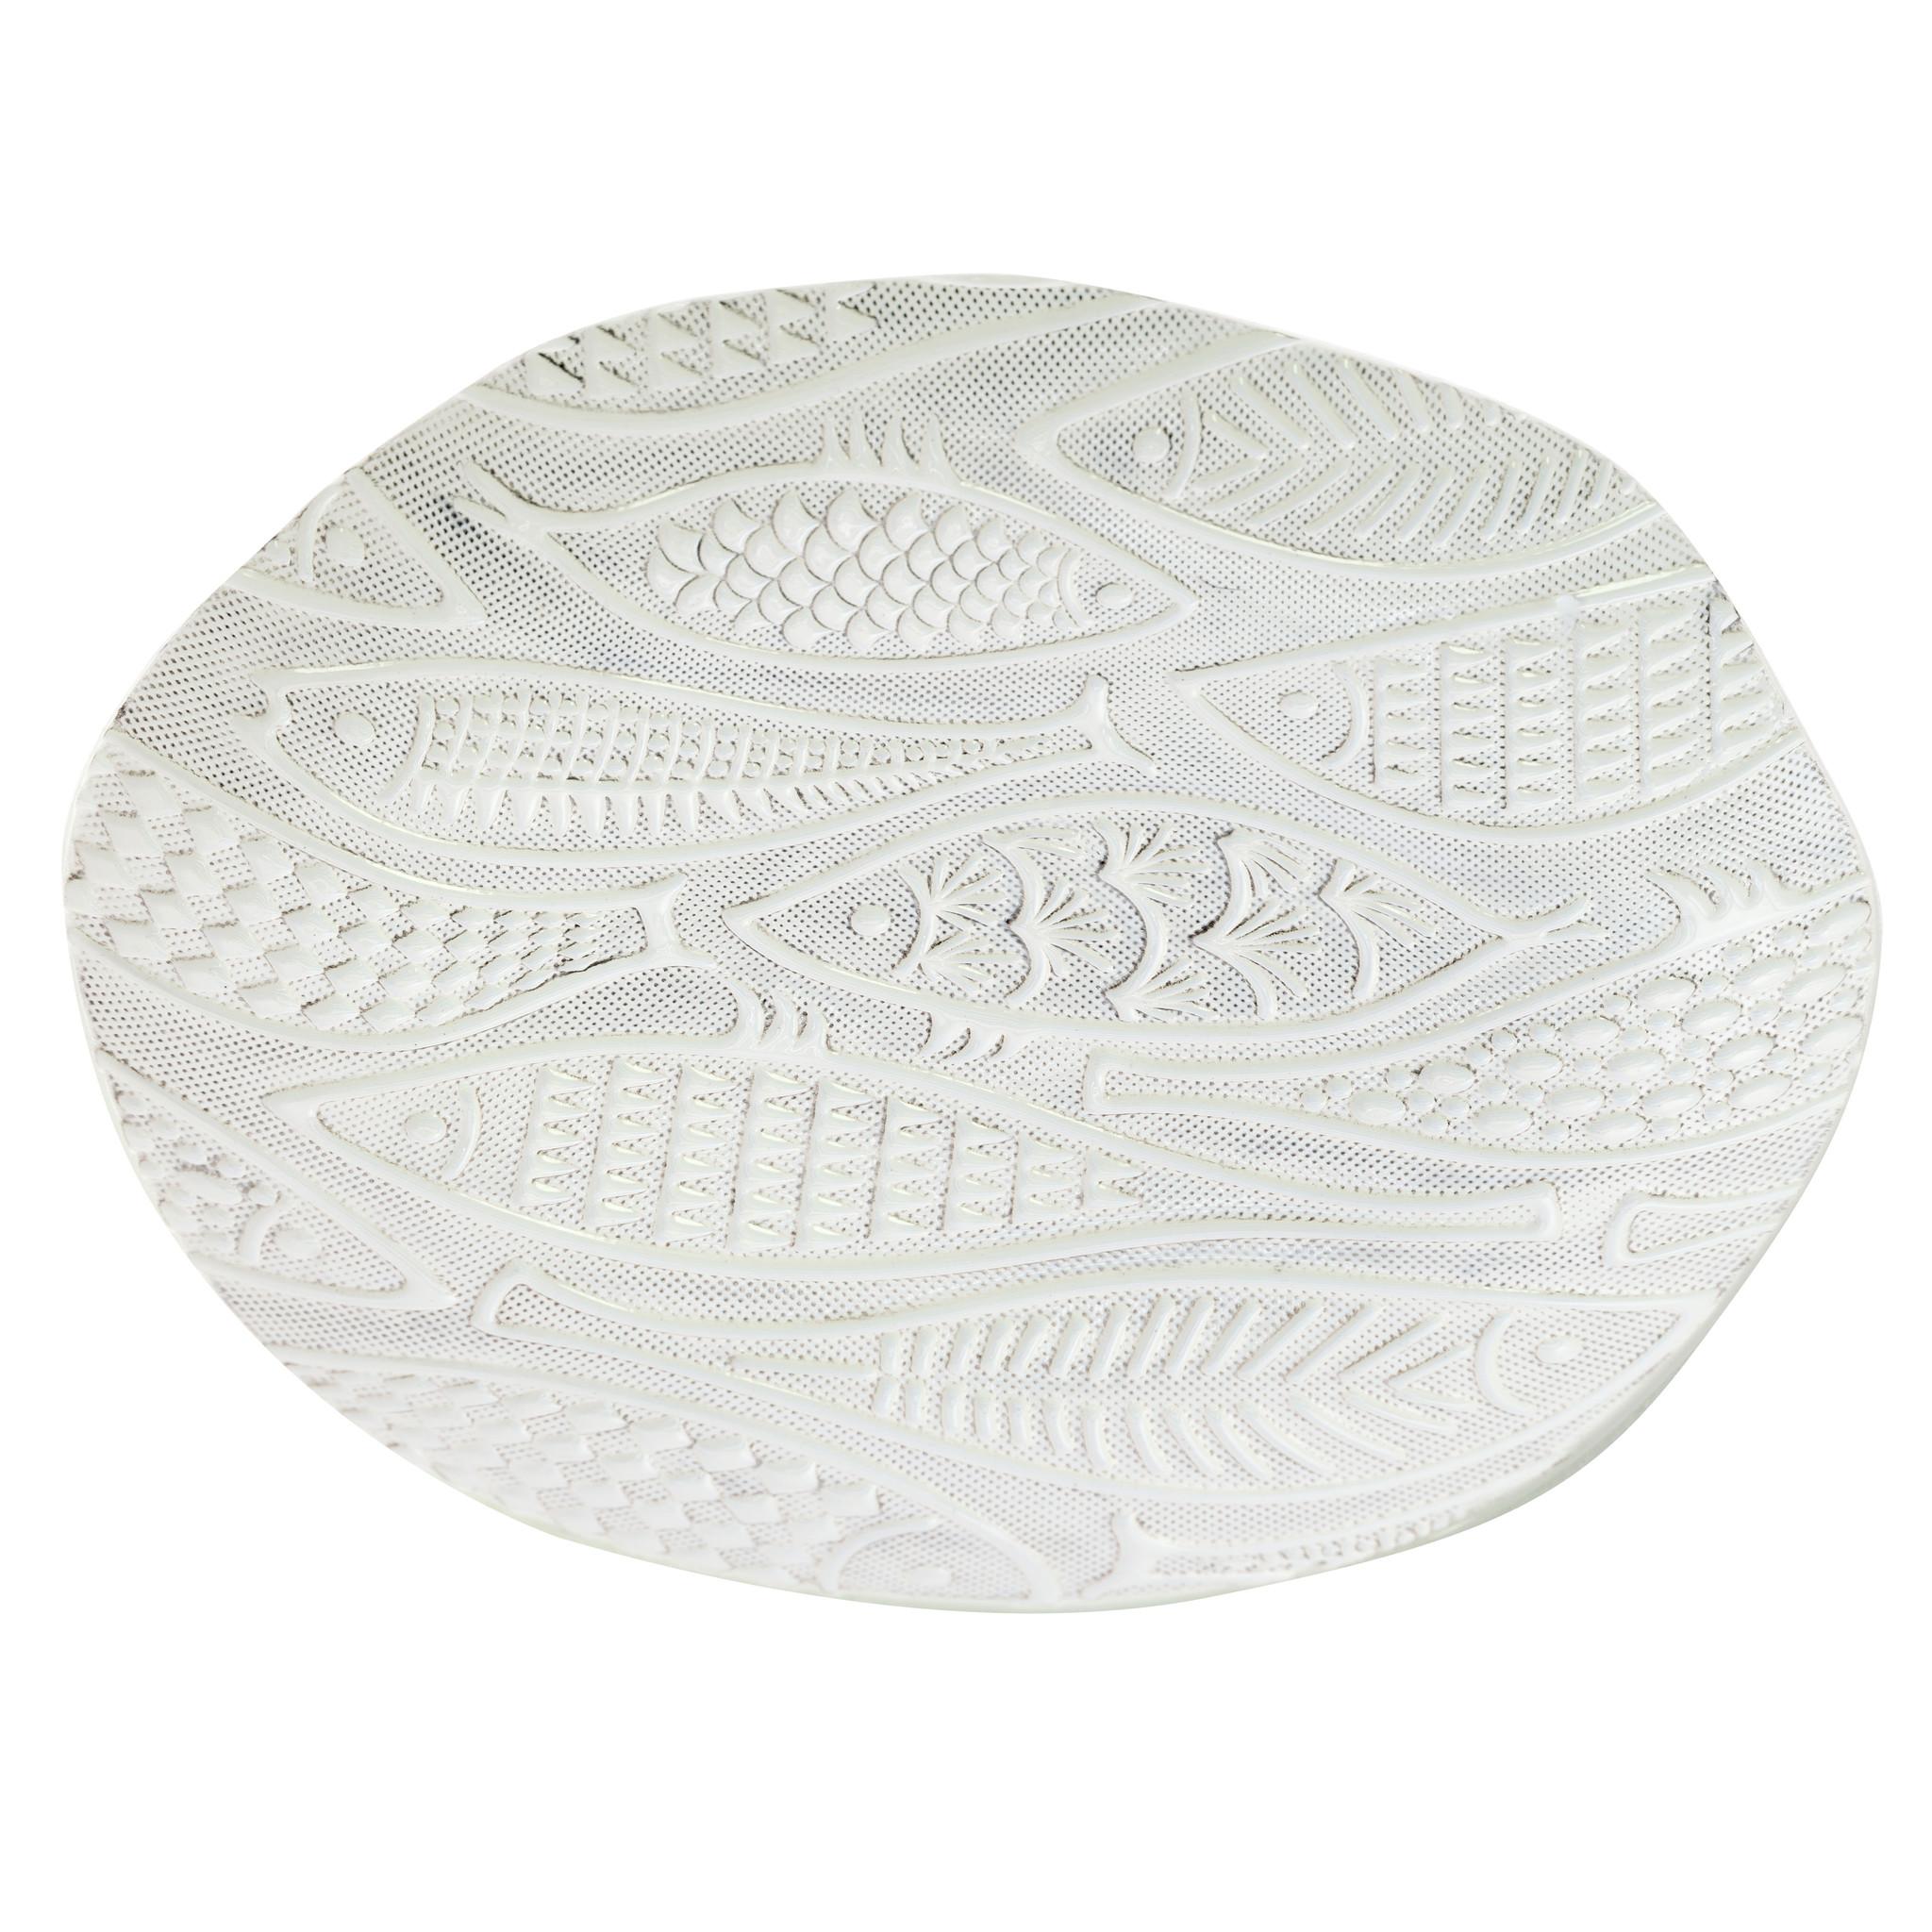 Блюдо BodensdorfДекоративные блюда<br><br><br>Material: Керамика<br>Depth см: None<br>Height см: 4<br>Diameter см: 34